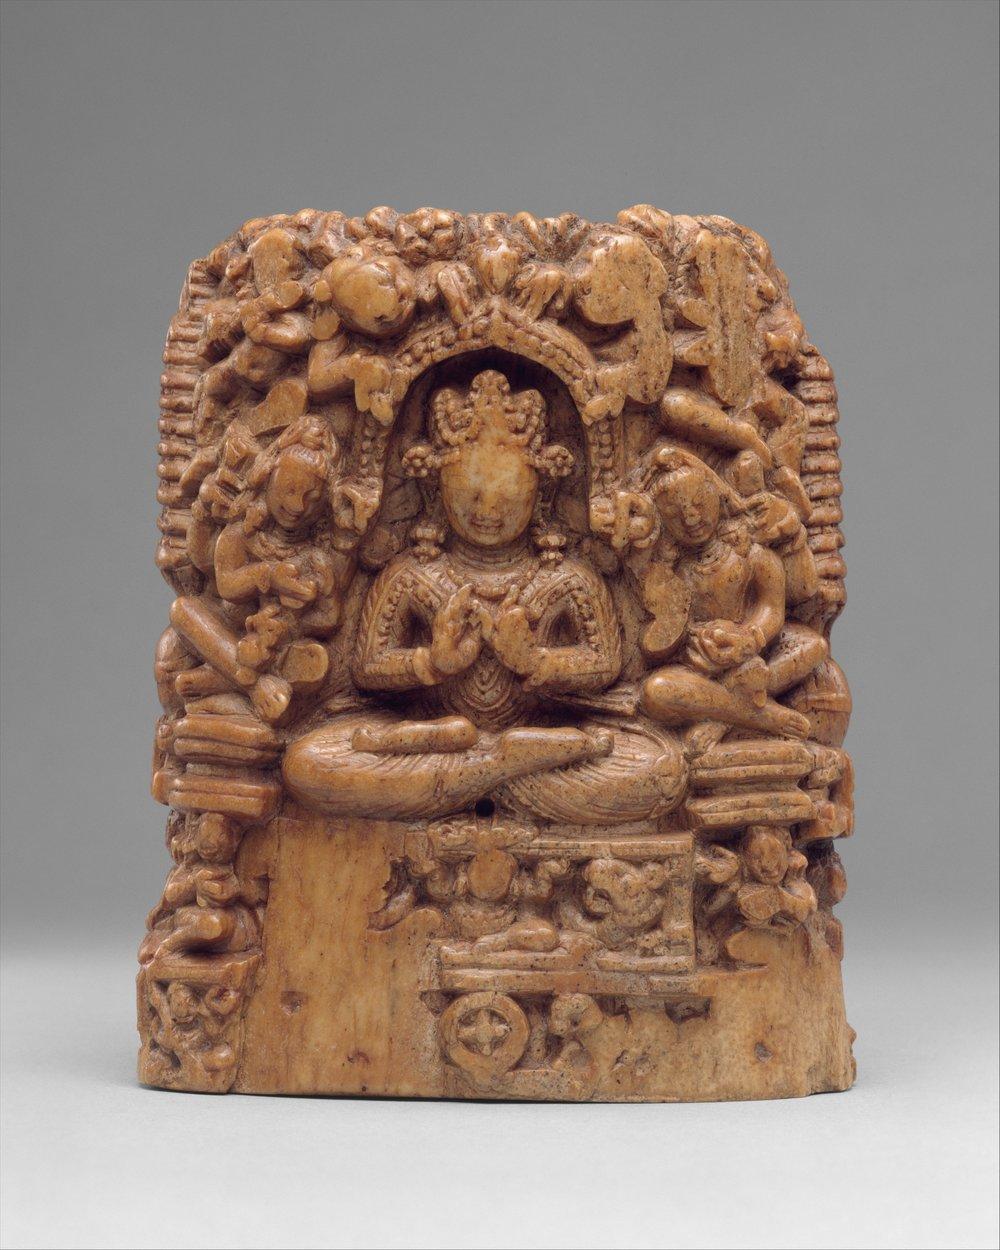 reliquary-buddha-metartmuseum-kashmir